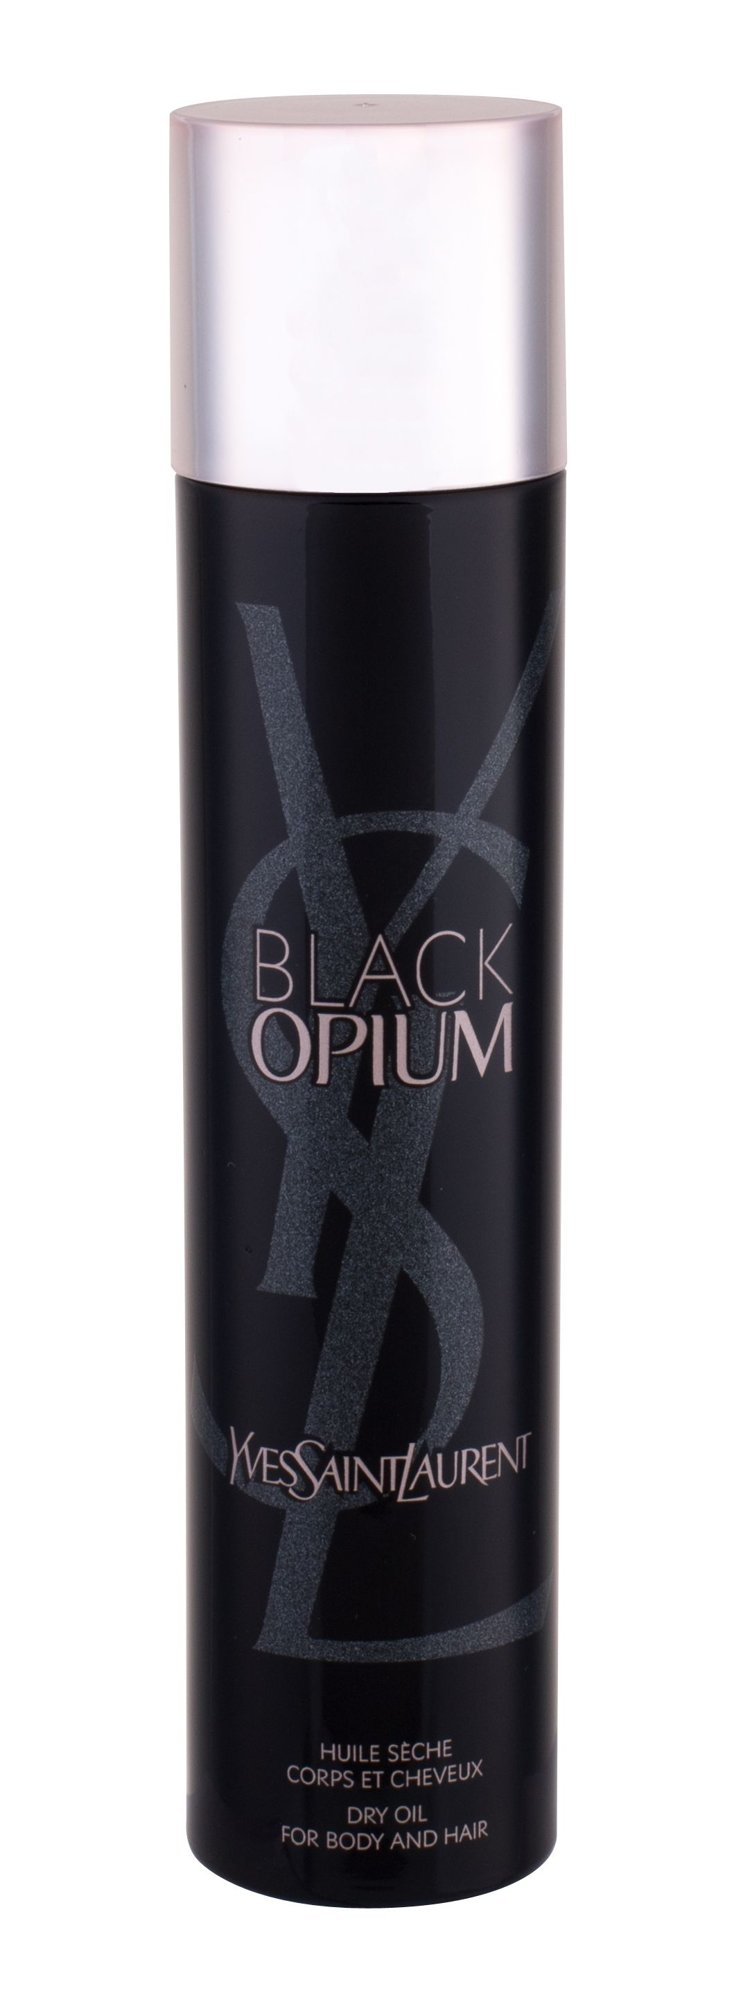 Yves Saint Laurent Black Opium Perfumed oil 100ml